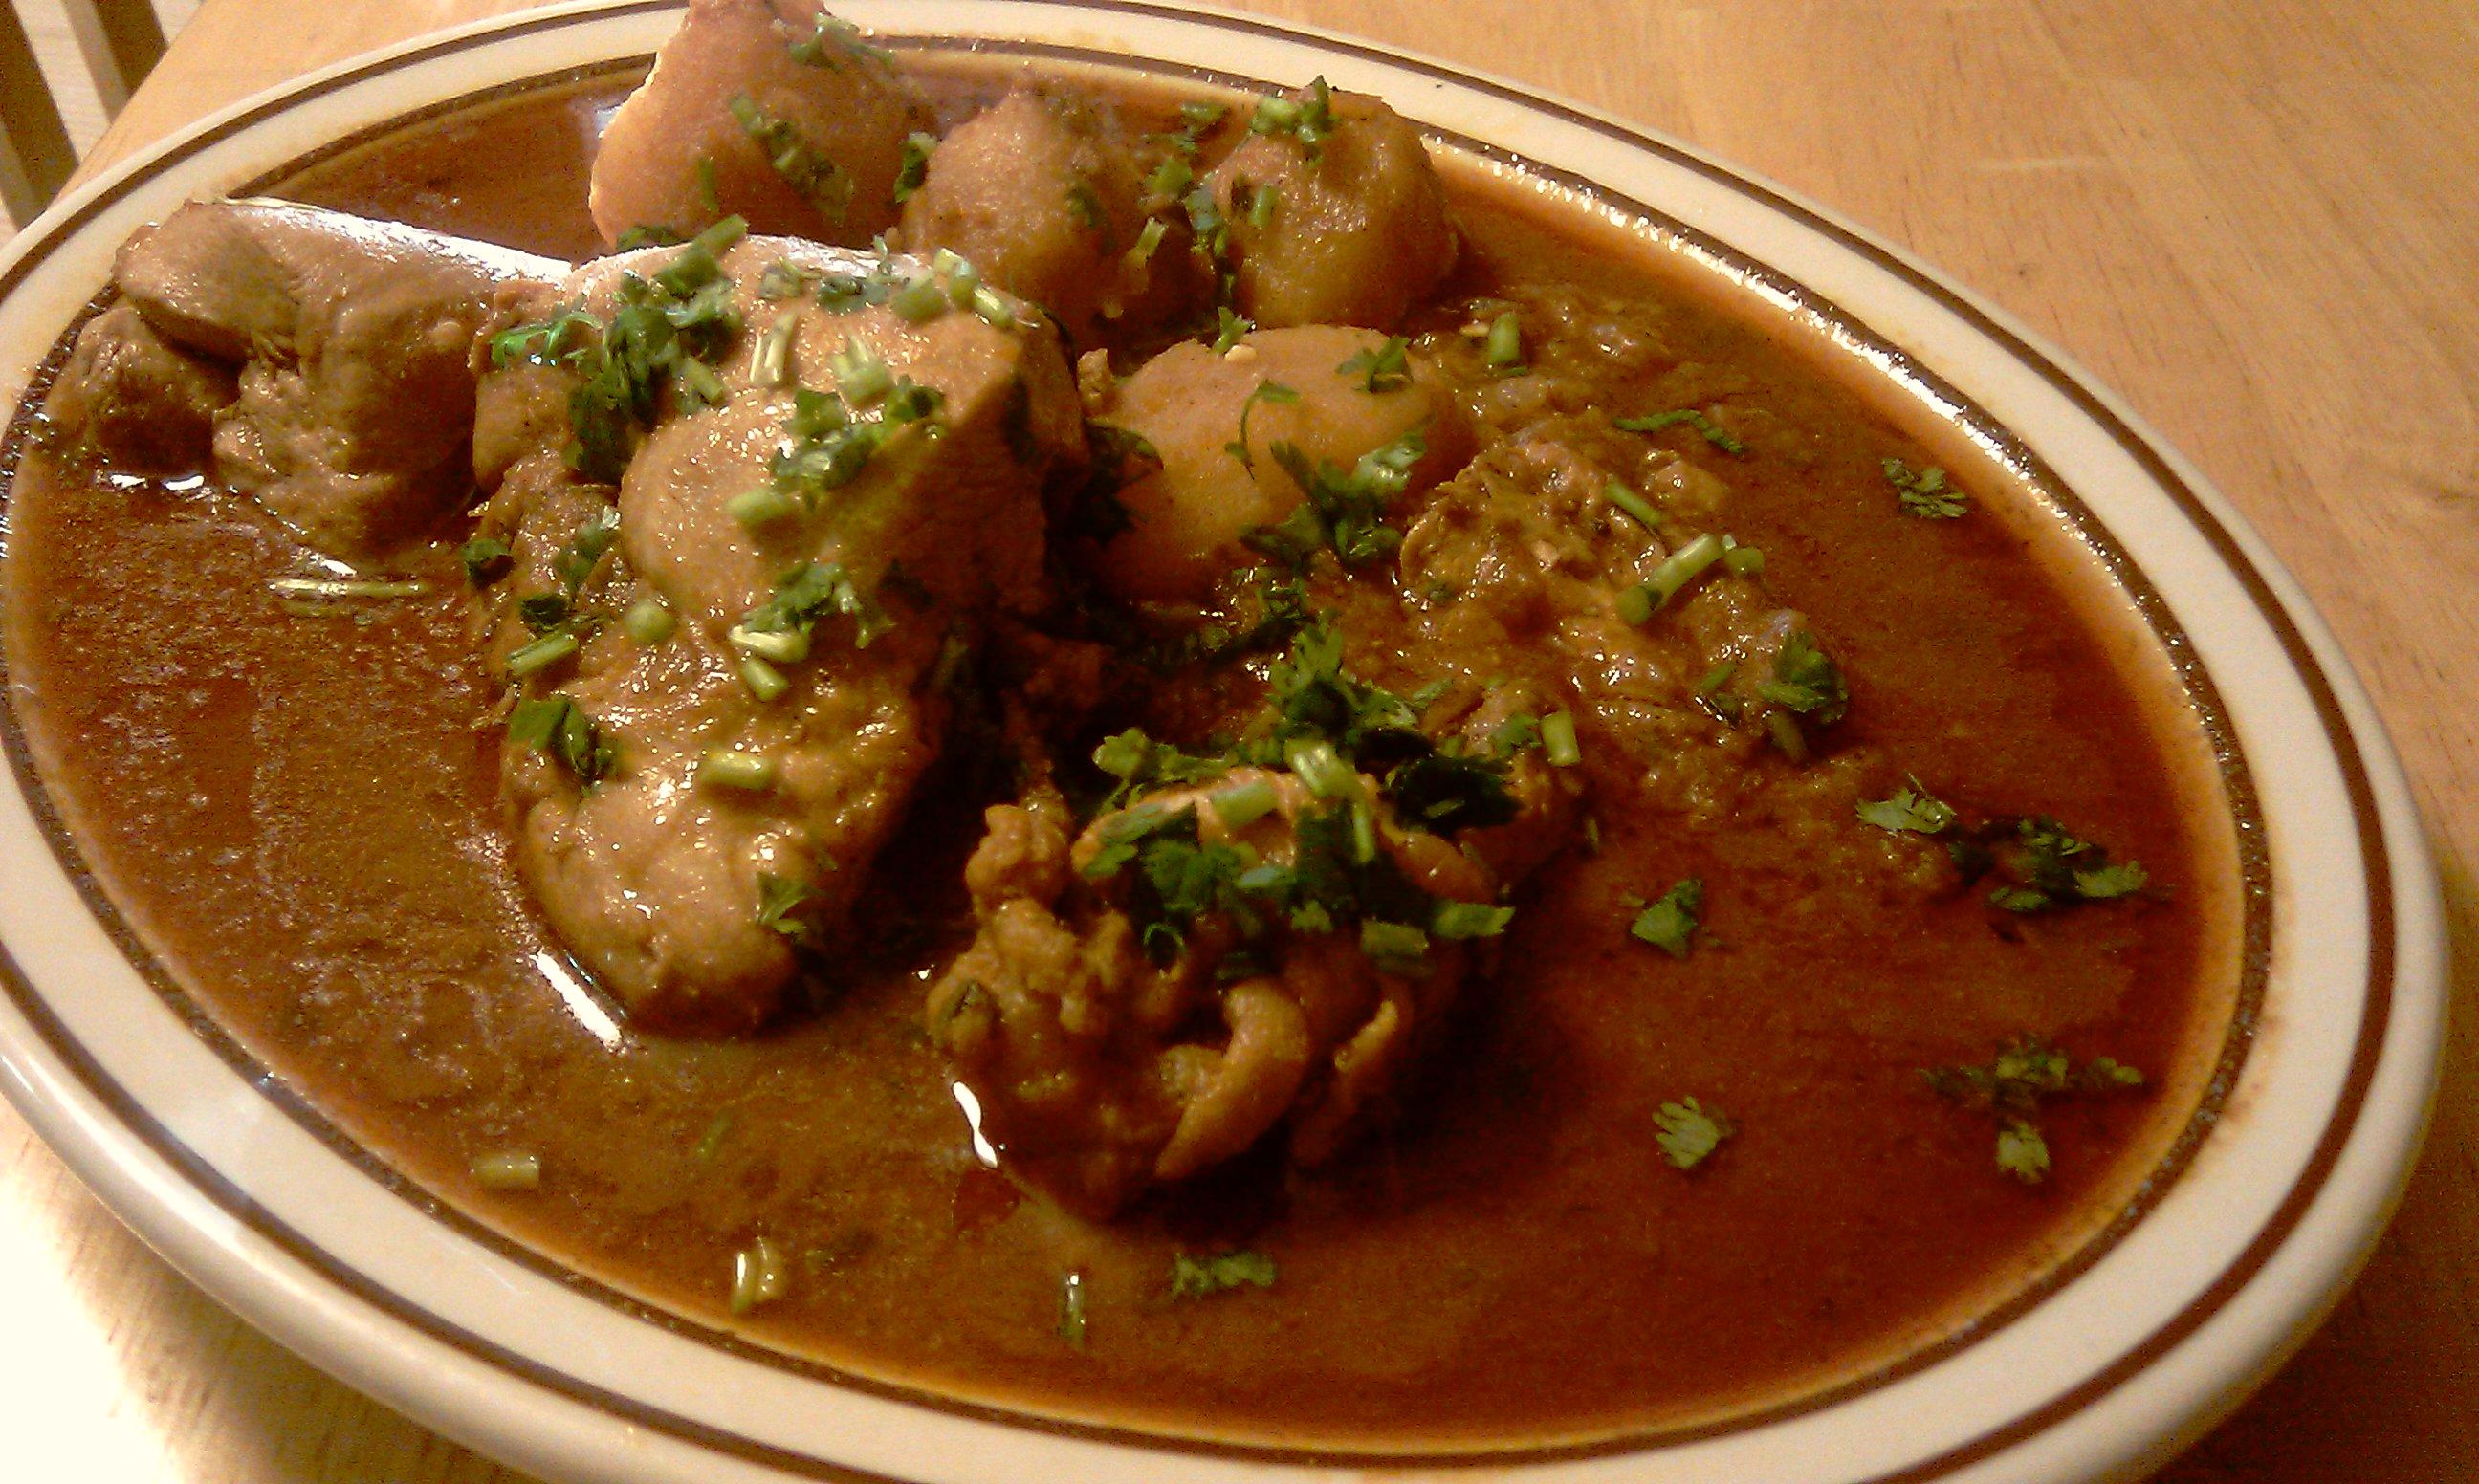 Korma - Almost Eatable